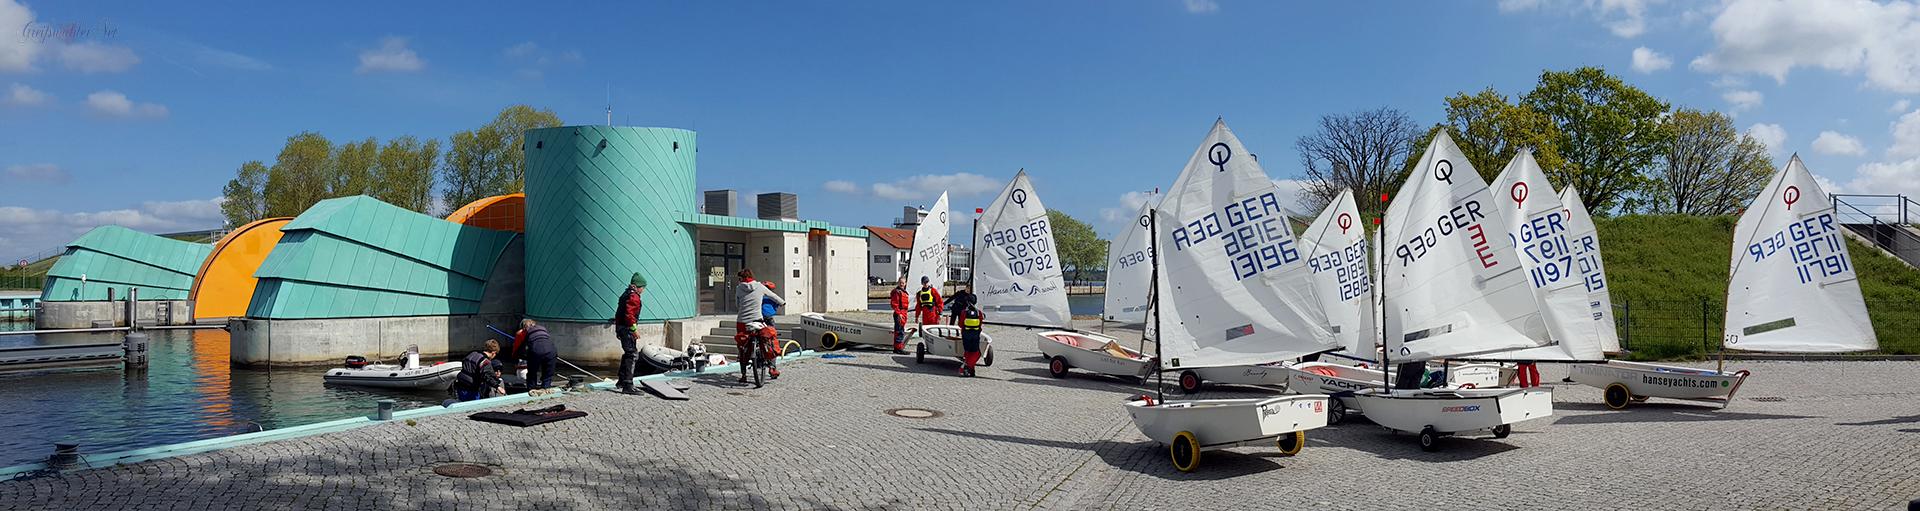 Segelboote (Optimisten-Jolle) am Sperrwerk in Greifswald-Wieck